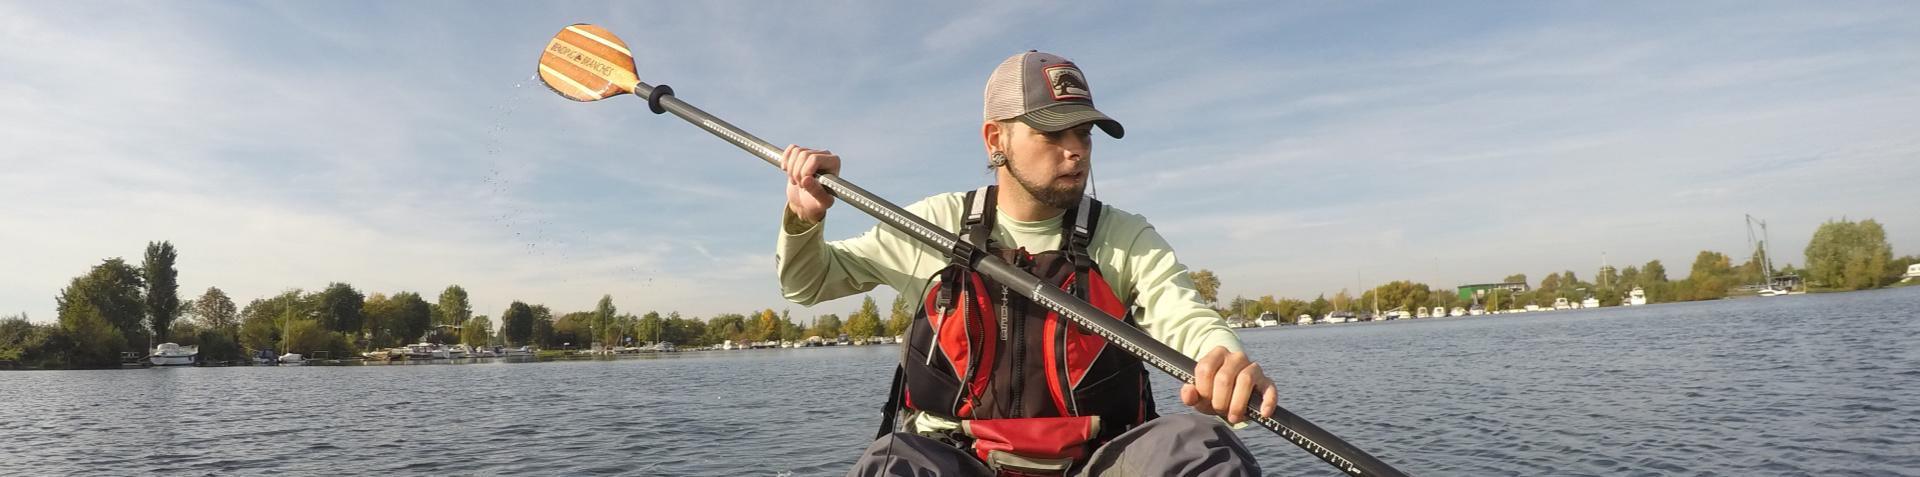 Kayak Paddles: Angler Navigator by Bending Branches - Image 3505